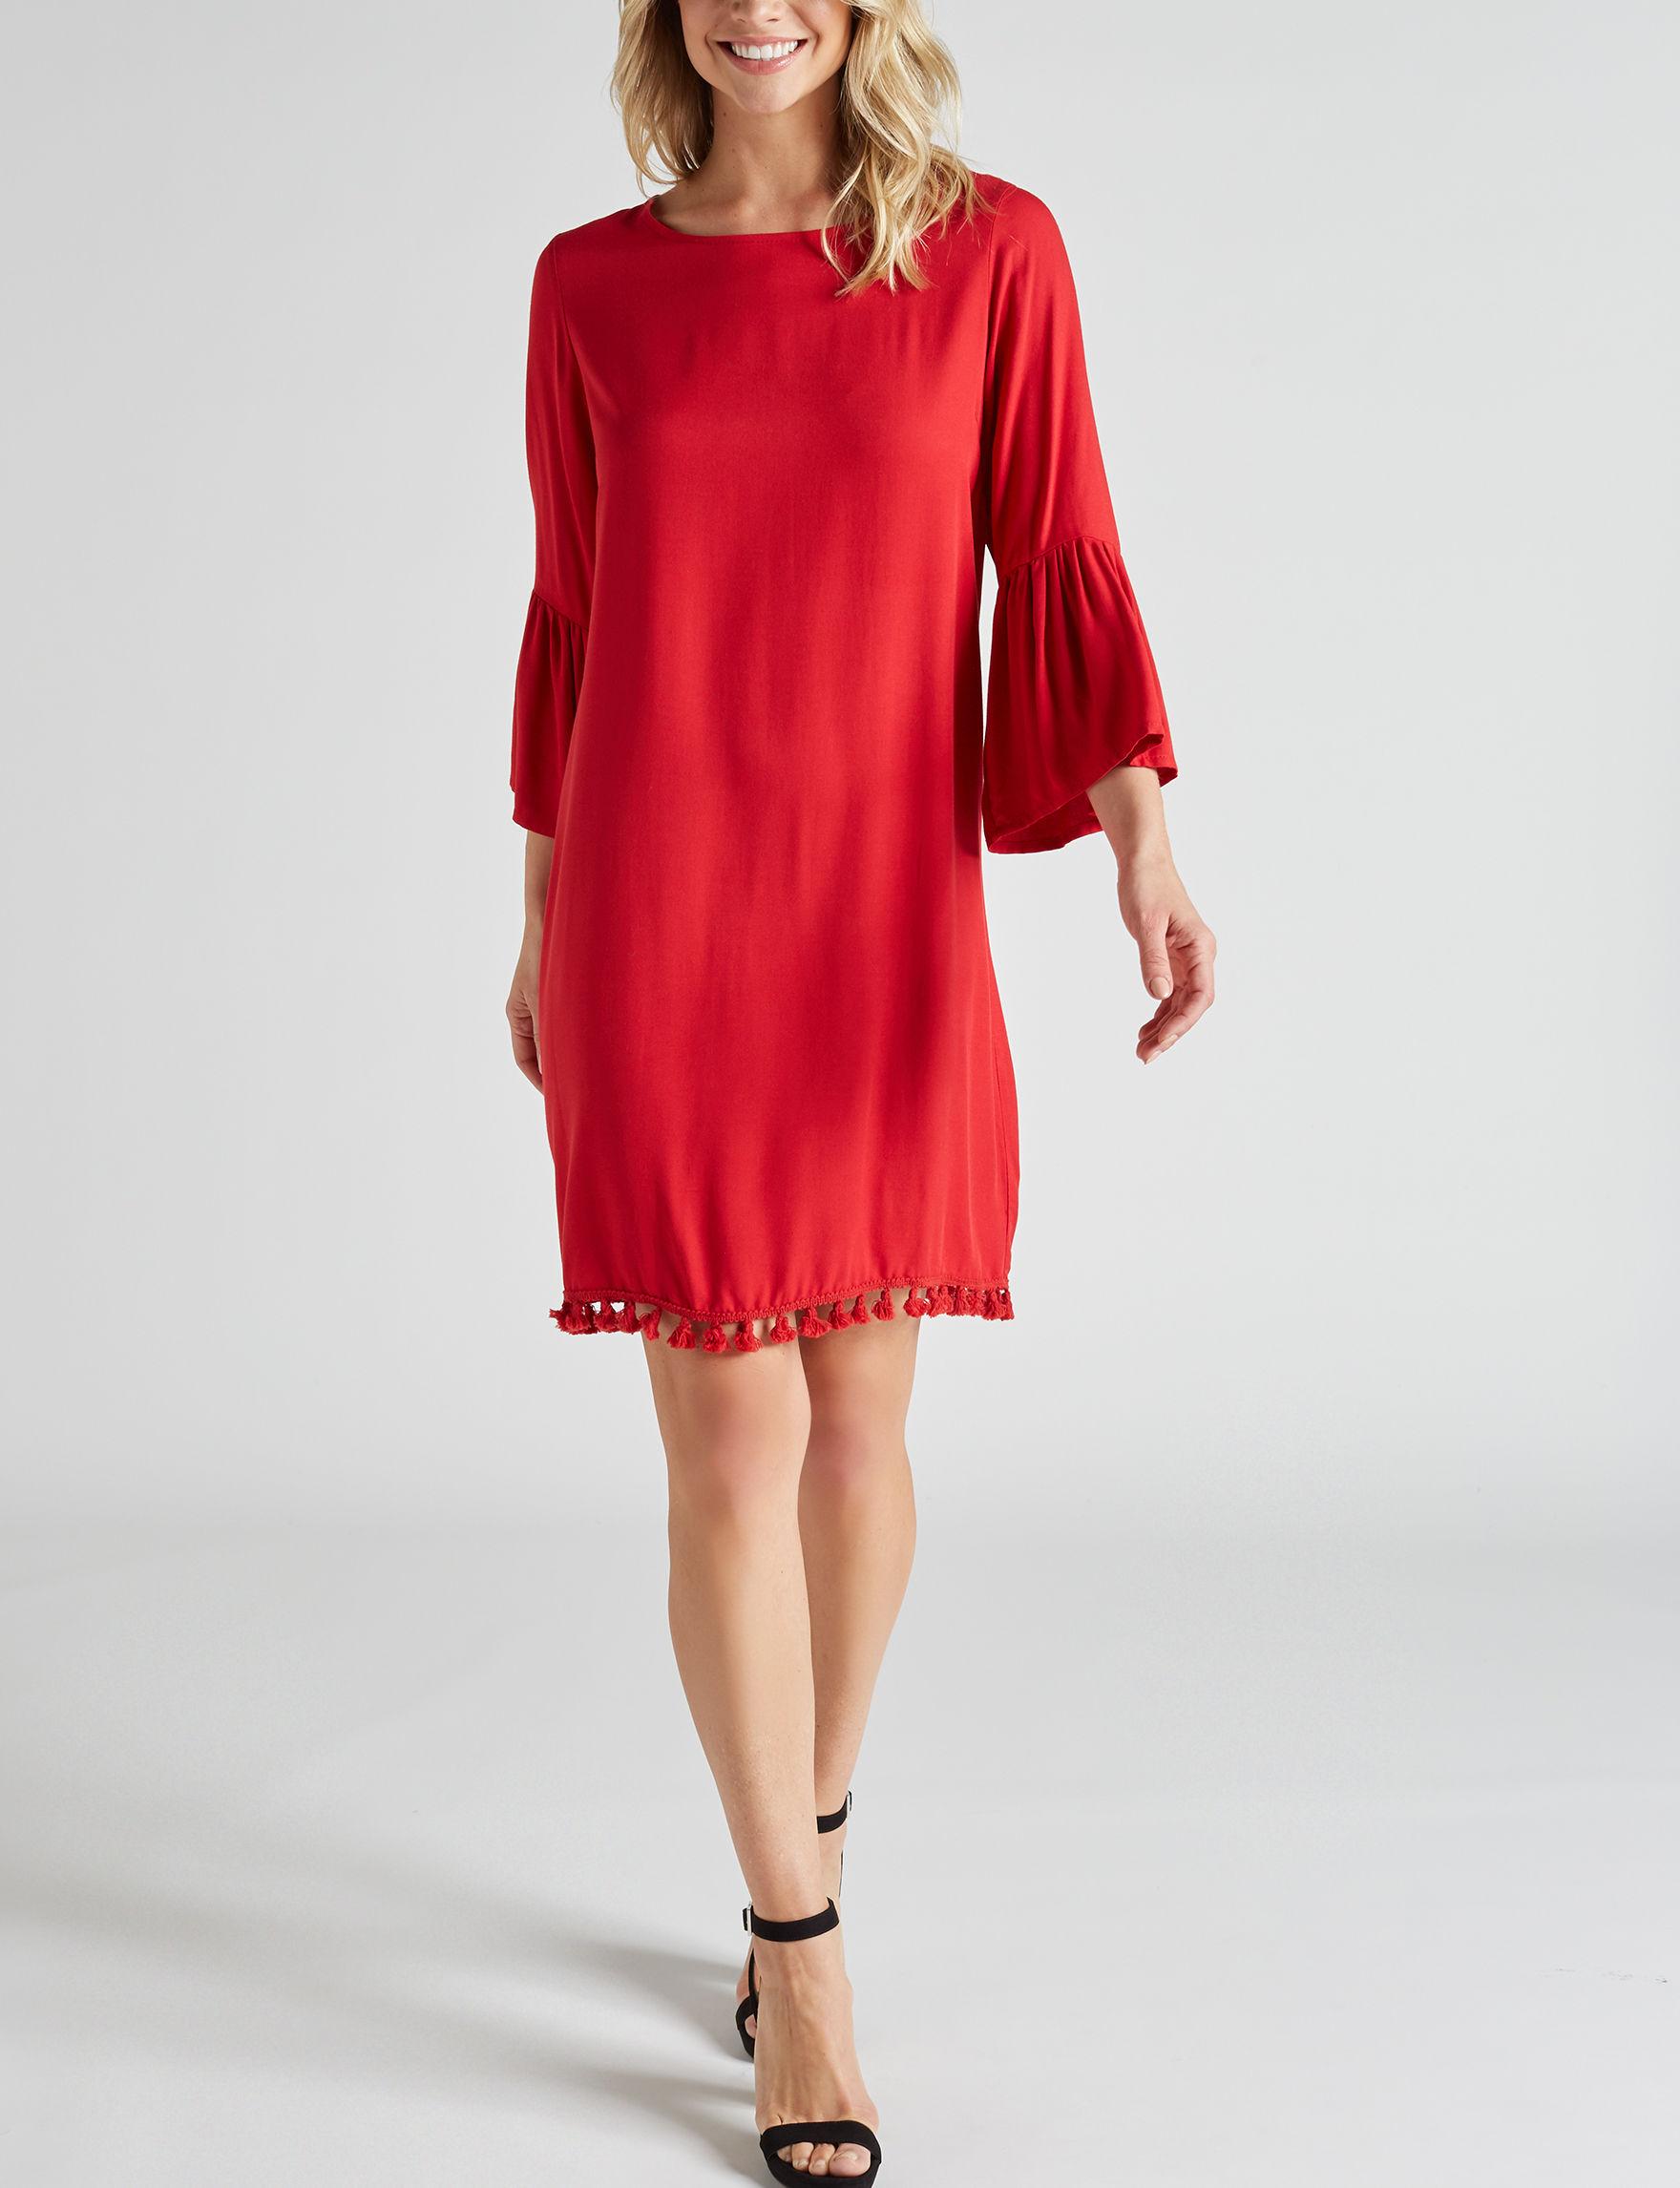 Signature Studio Red Everyday & Casual Shift Dresses